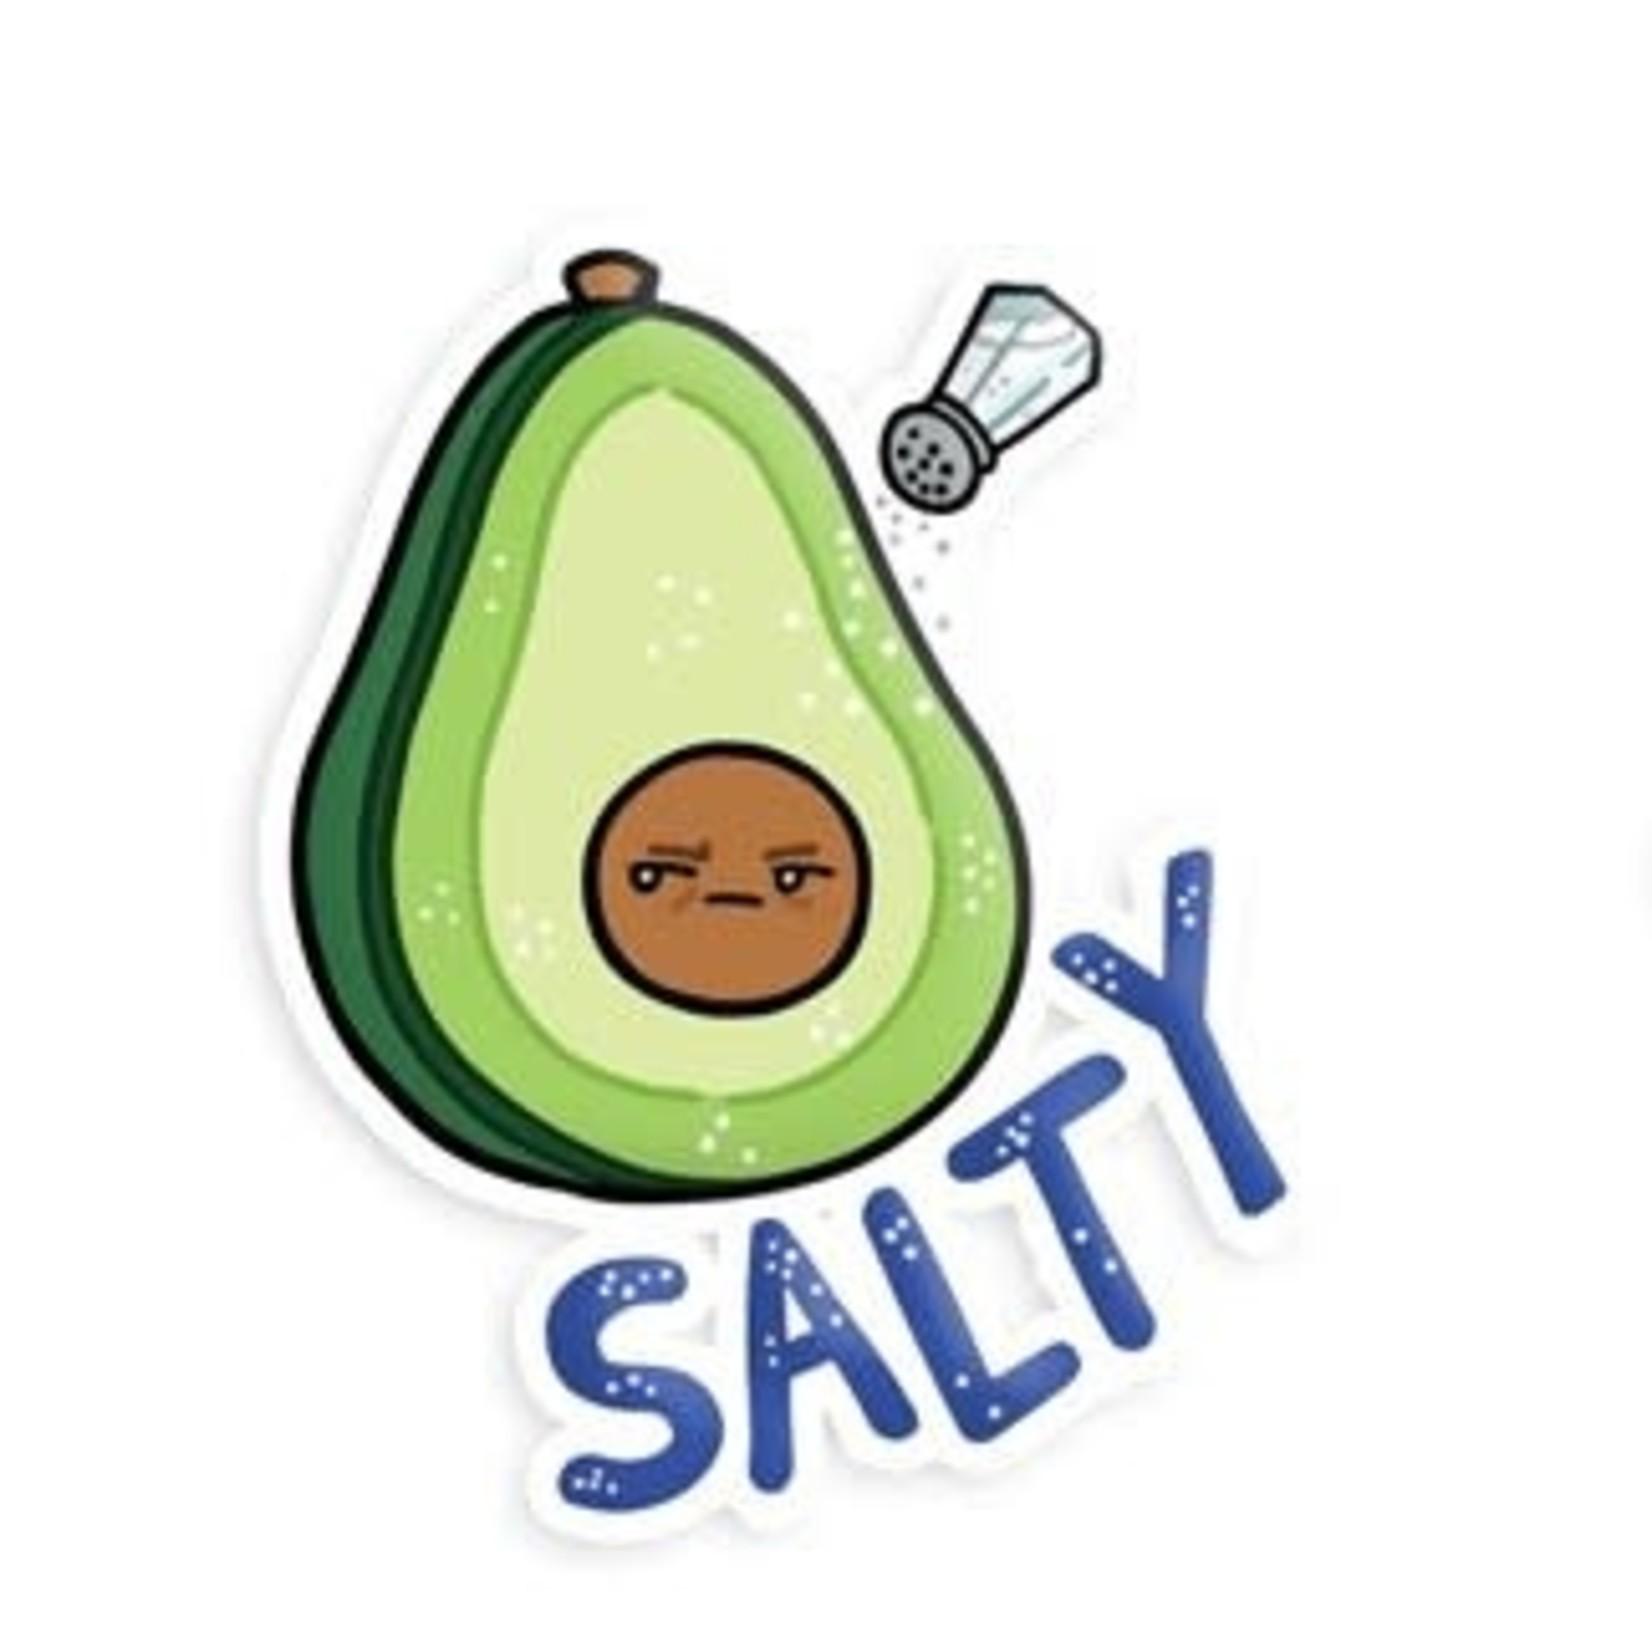 Squishable Salty Avocado Stickers